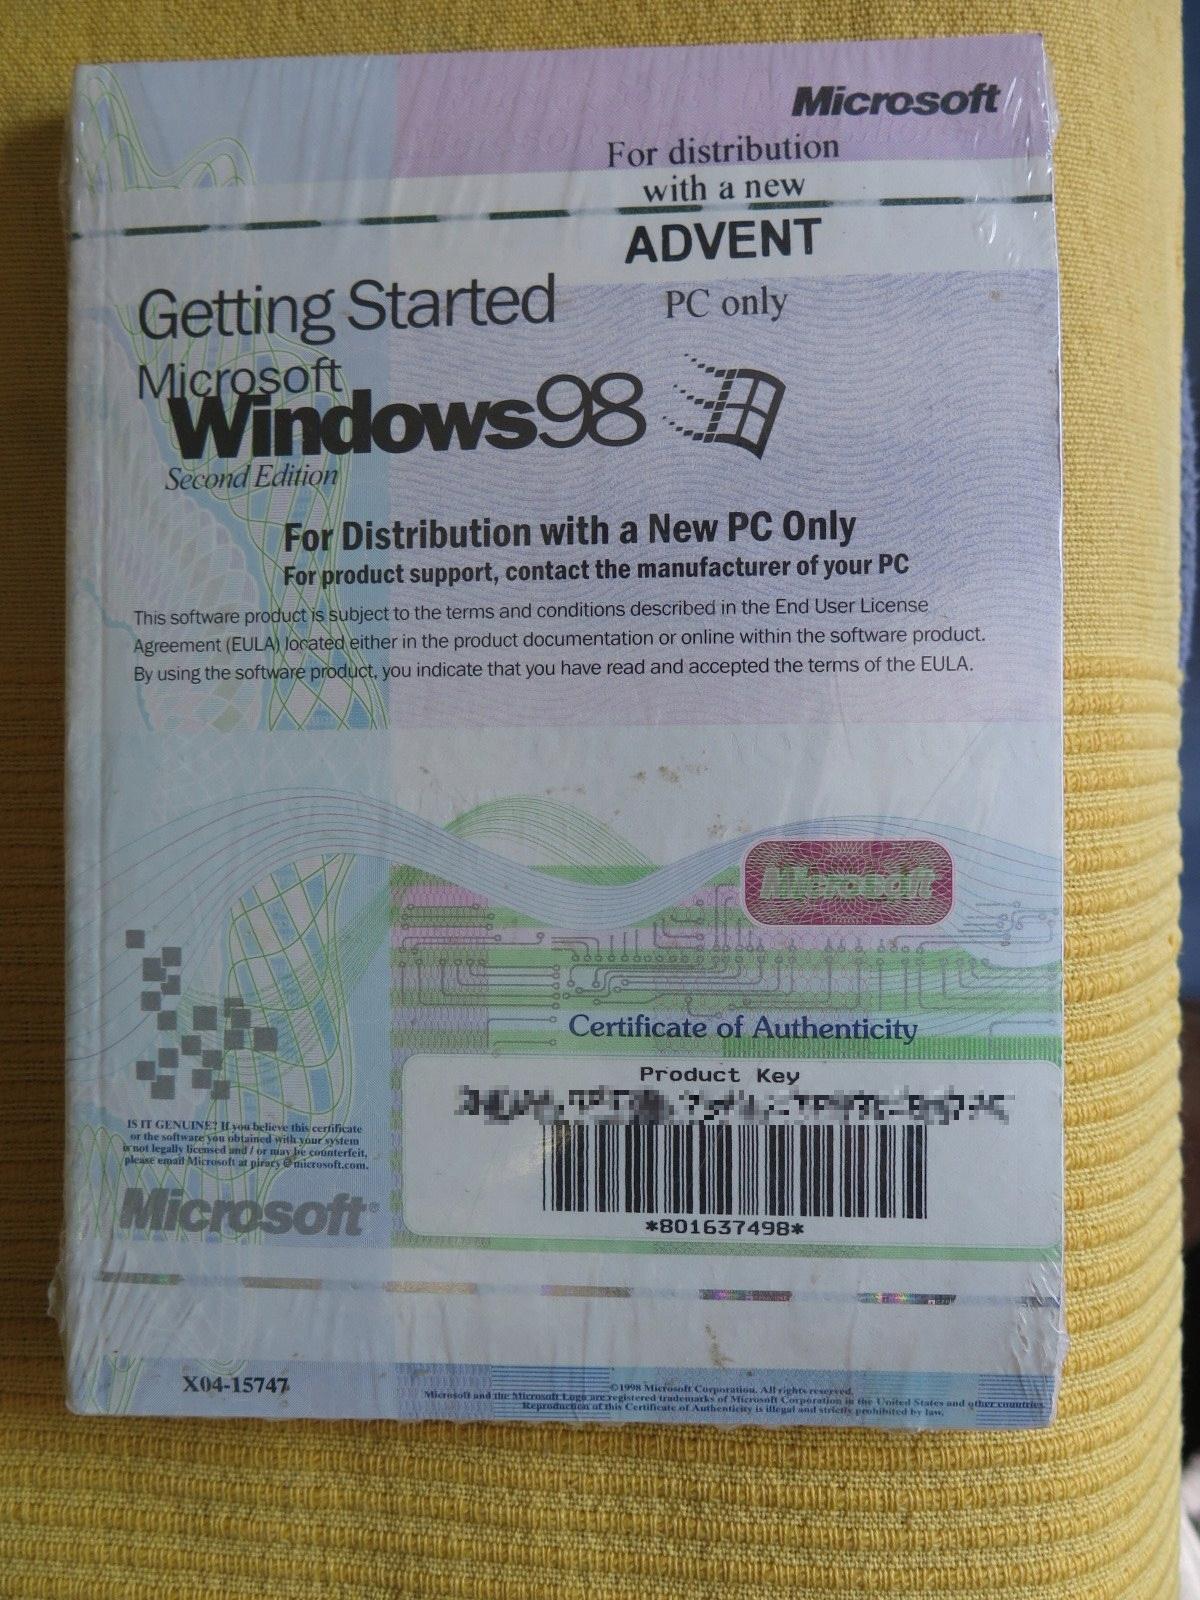 MICROSOFT WINDOWS 98 SECOND EDITION